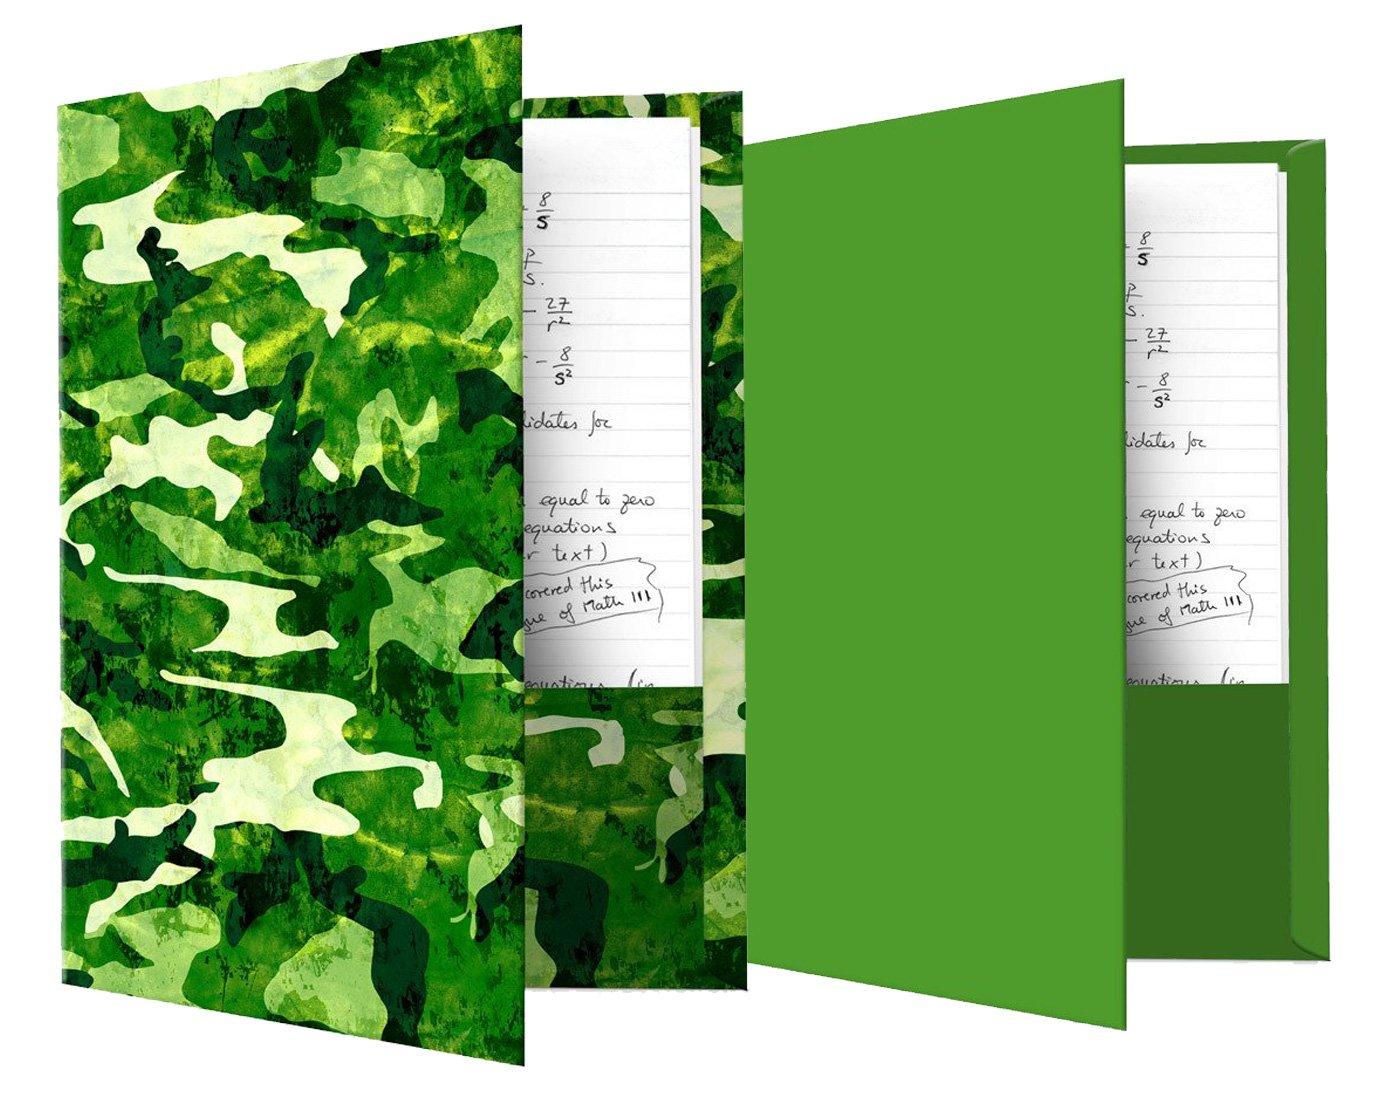 Book Soxフォルダ 2 Items 2 Items Green camo print and green solid B074KCSWF3